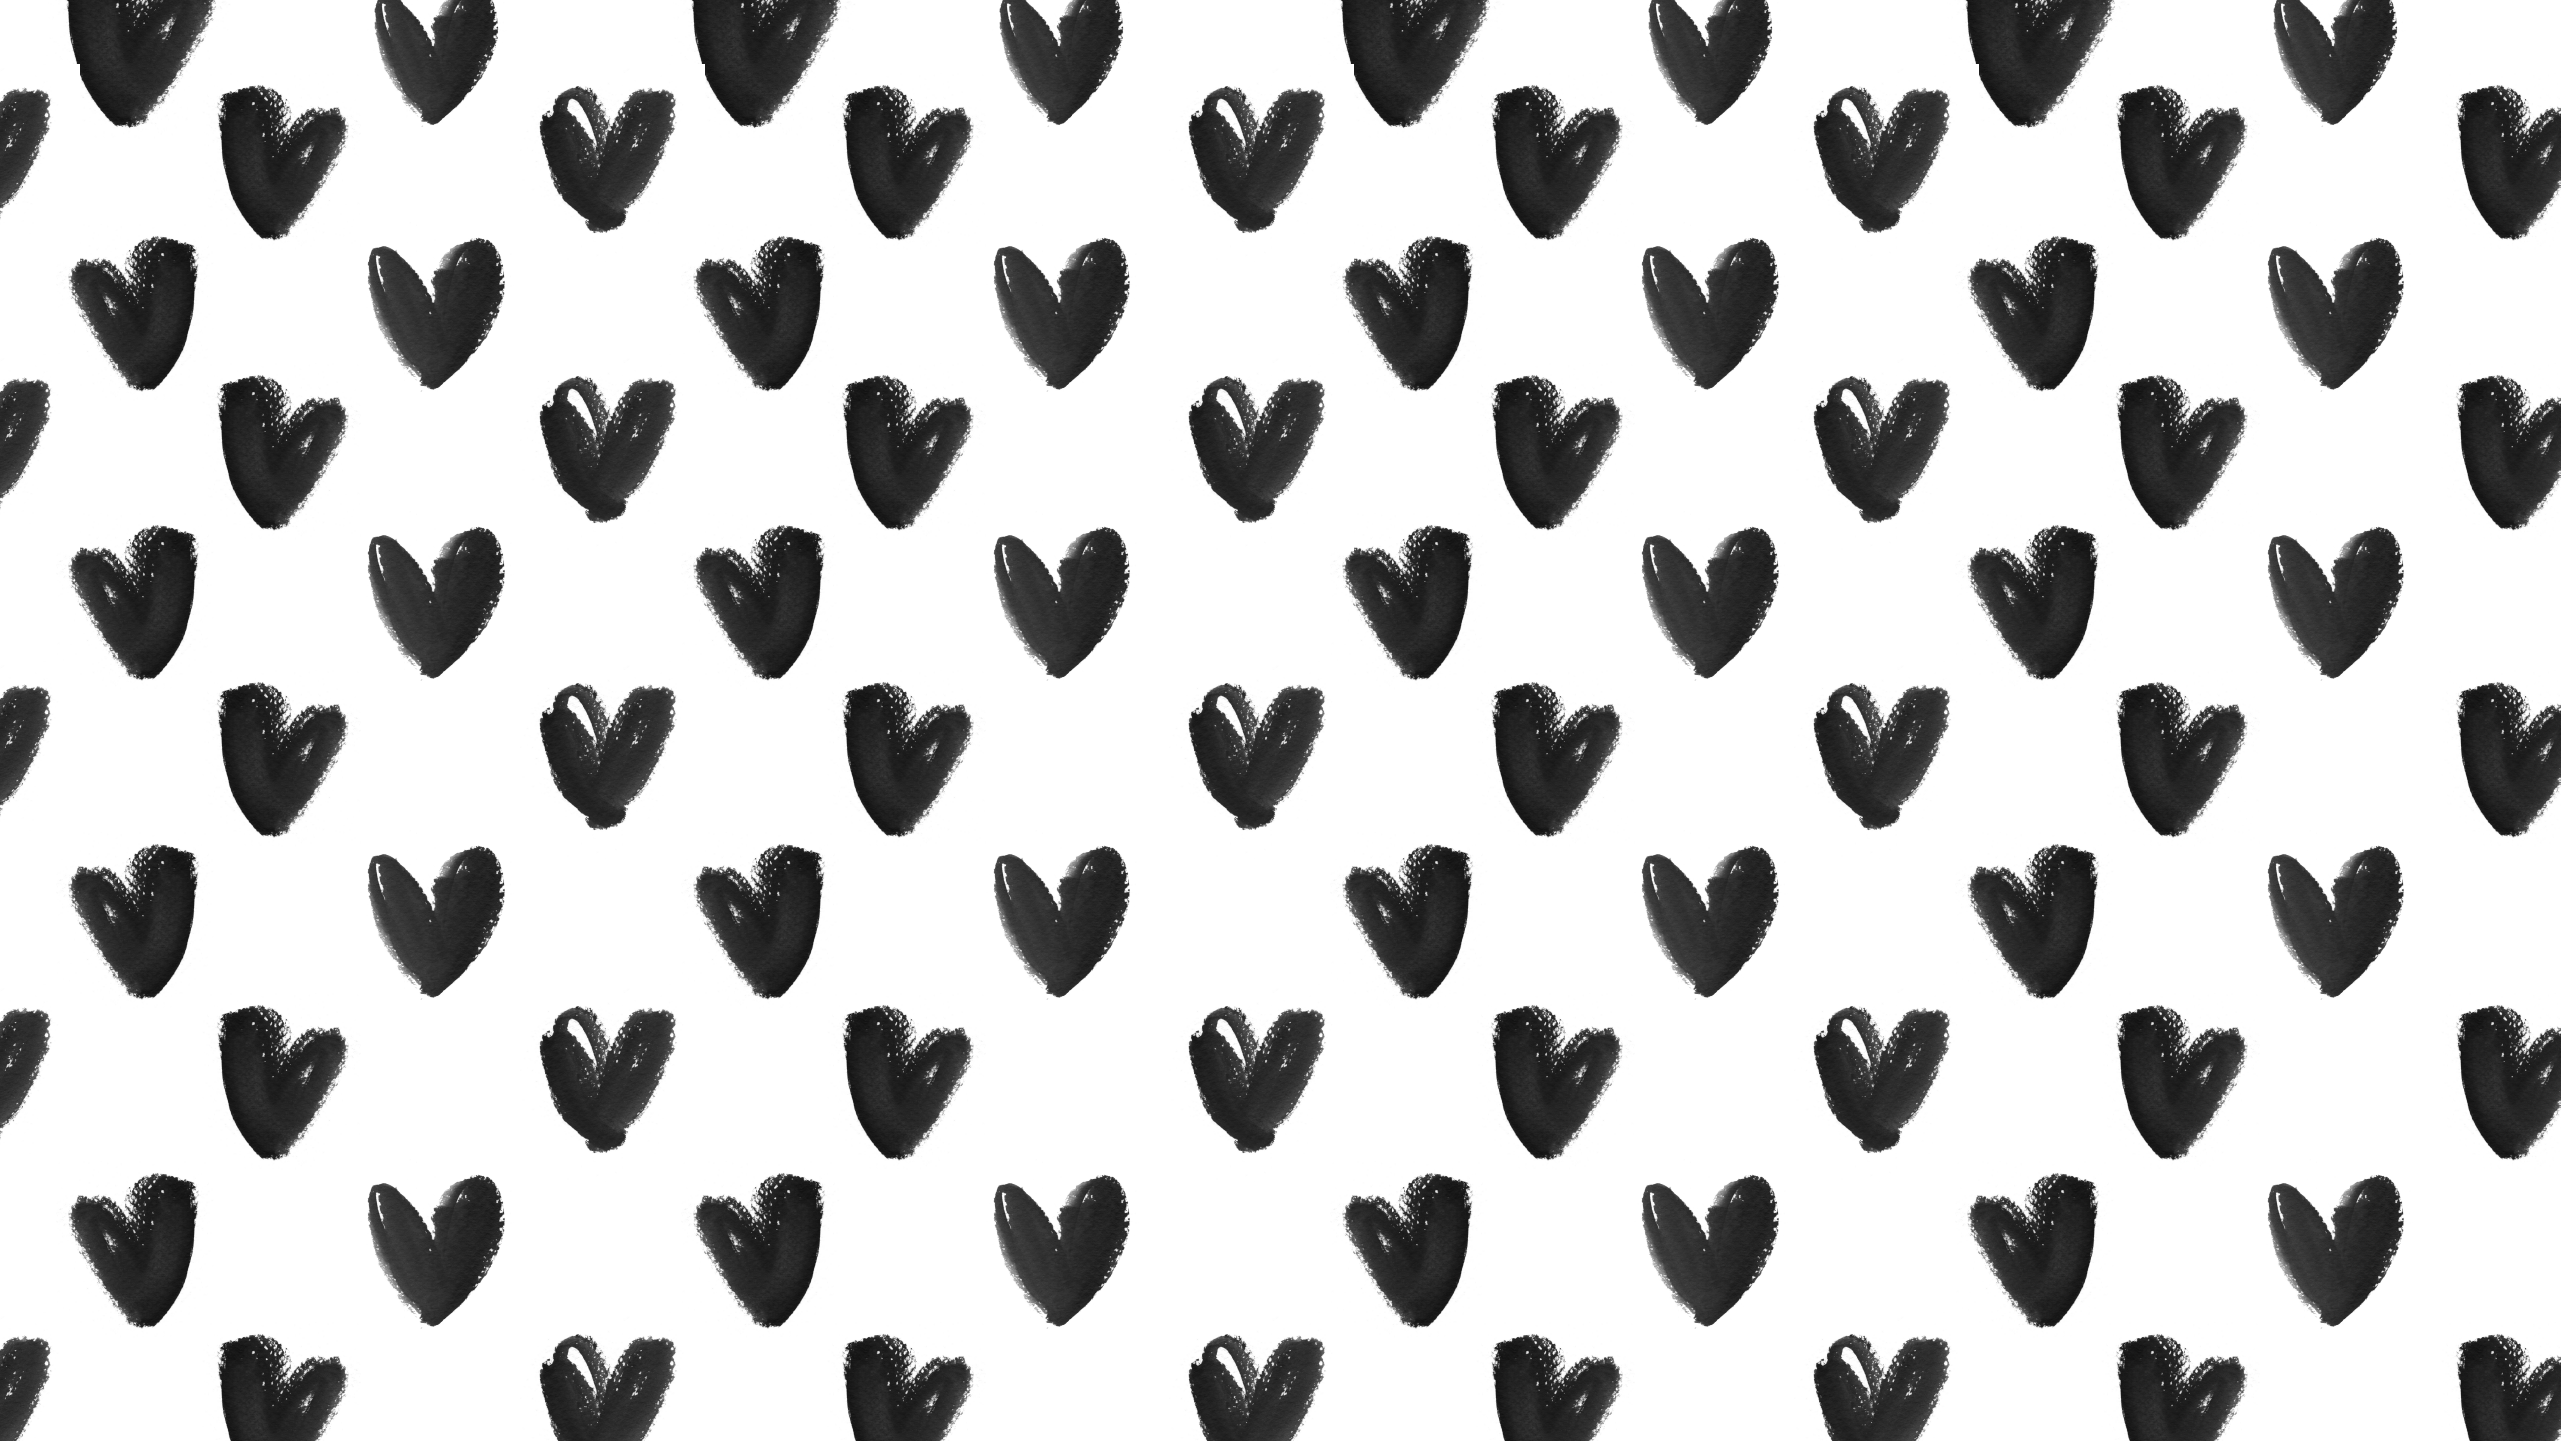 February Wallpaper Nicolesclasses 08 Png 2561 1441 February Wallpaper Cute Desktop Wallpaper Computer Wallpaper Desktop Wallpapers